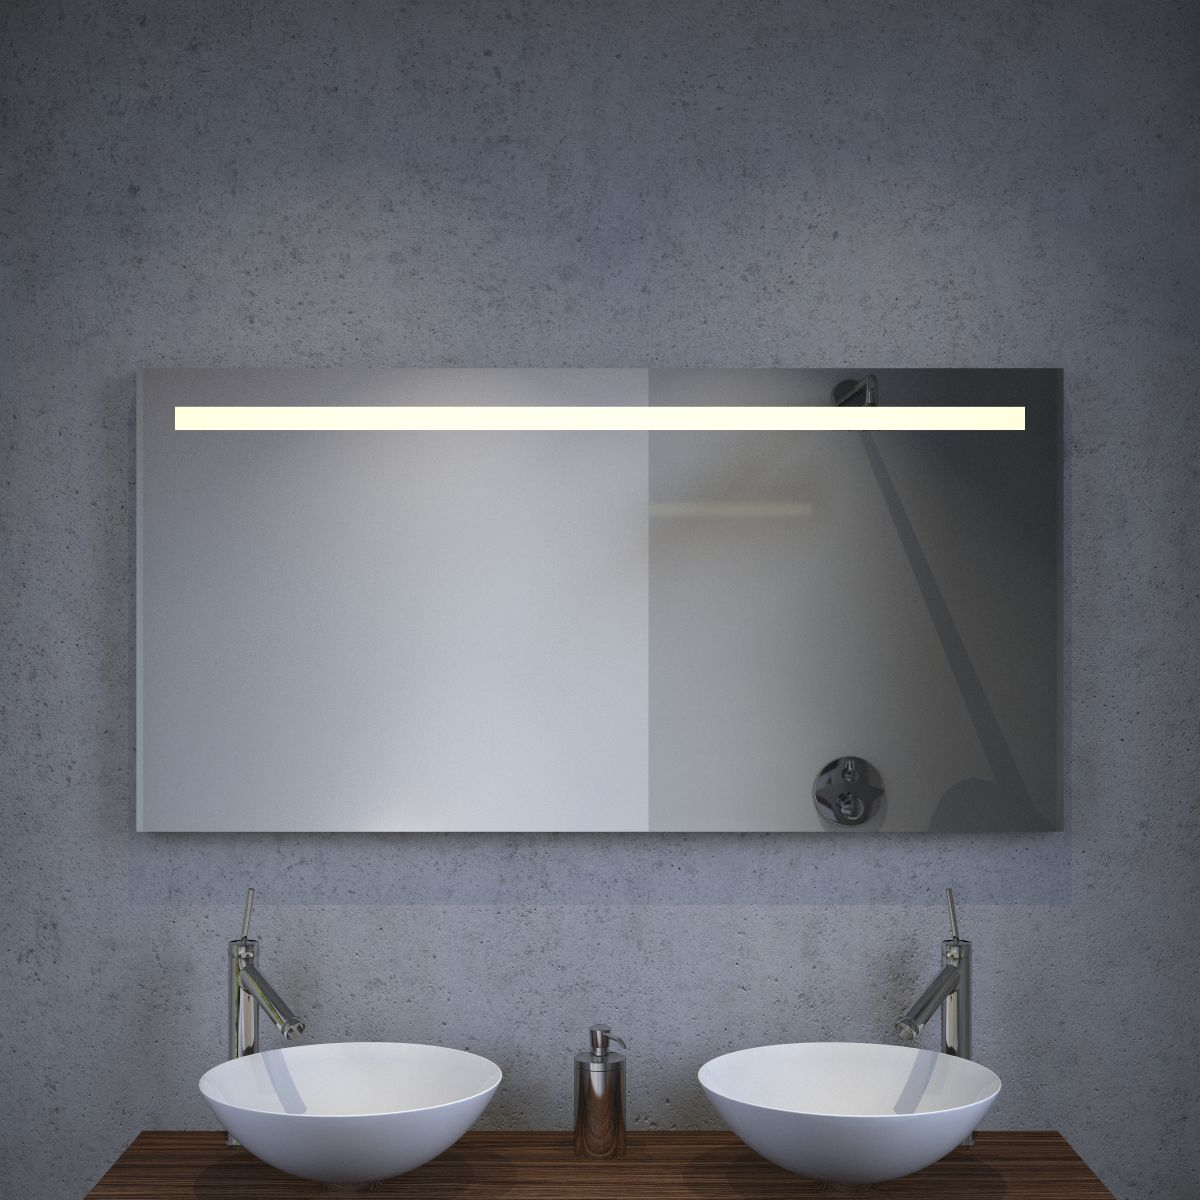 Badkamer LED spiegel met stopcontact verwarming en sensordimmer 120 ...